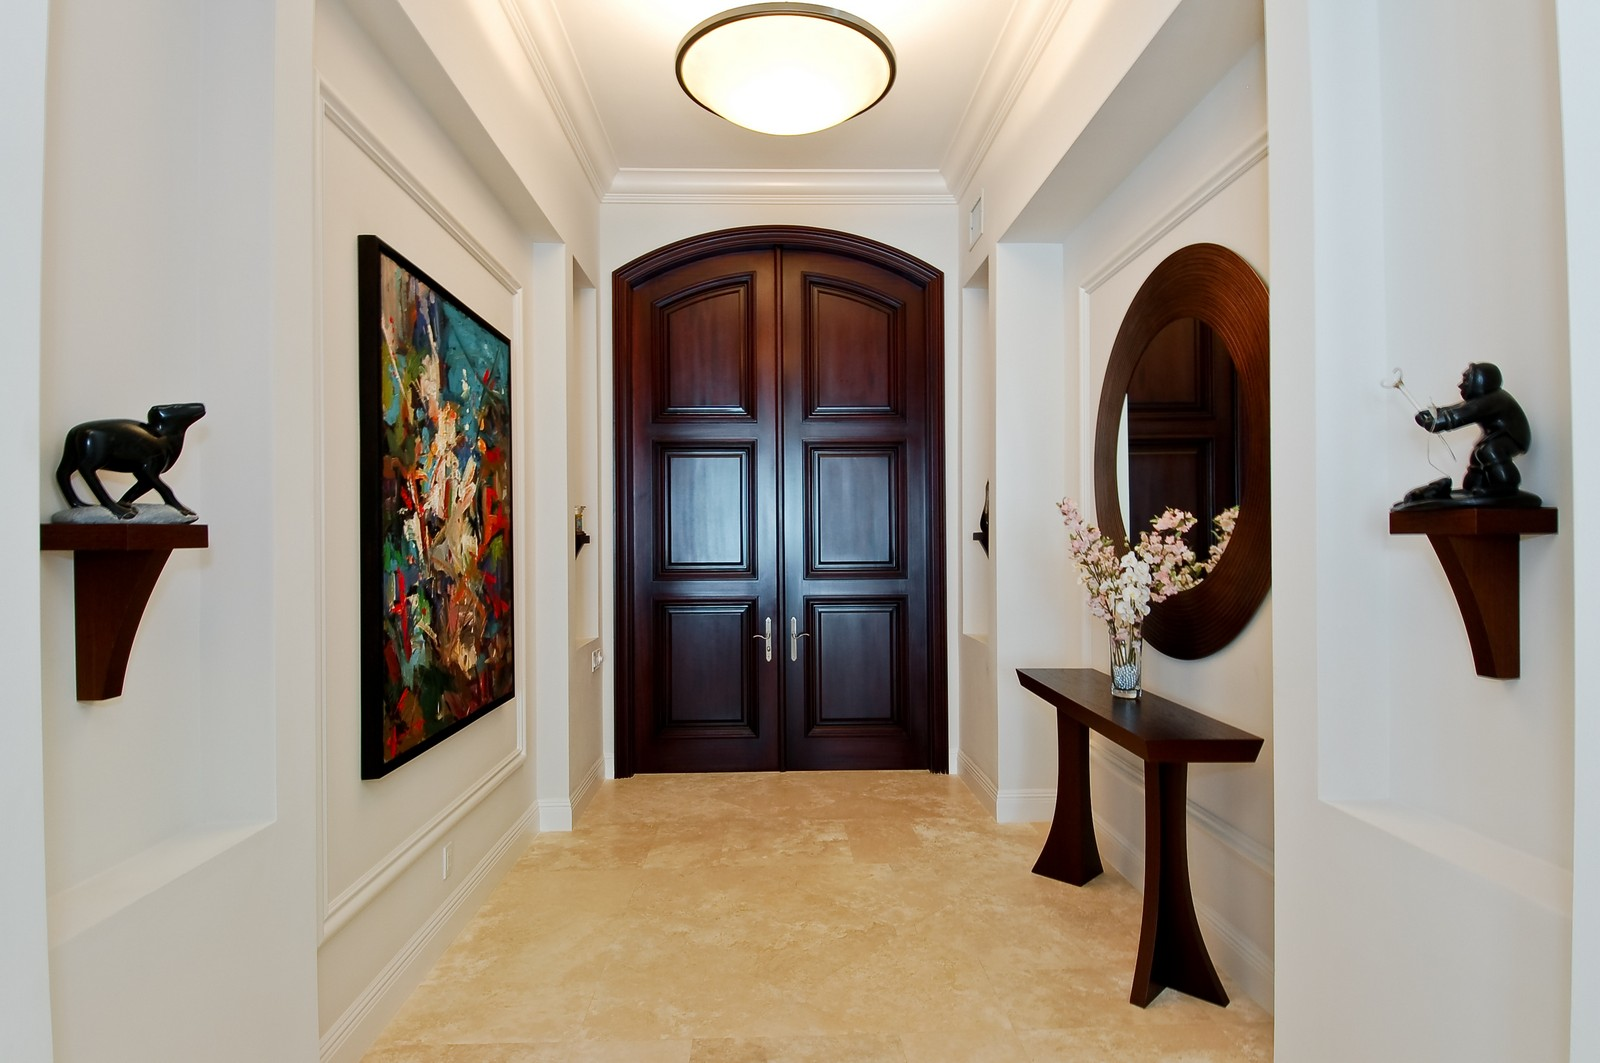 Real Estate Photography - 7478 Valencia Dr, Boca Raton, FL, 33433 - Foyer